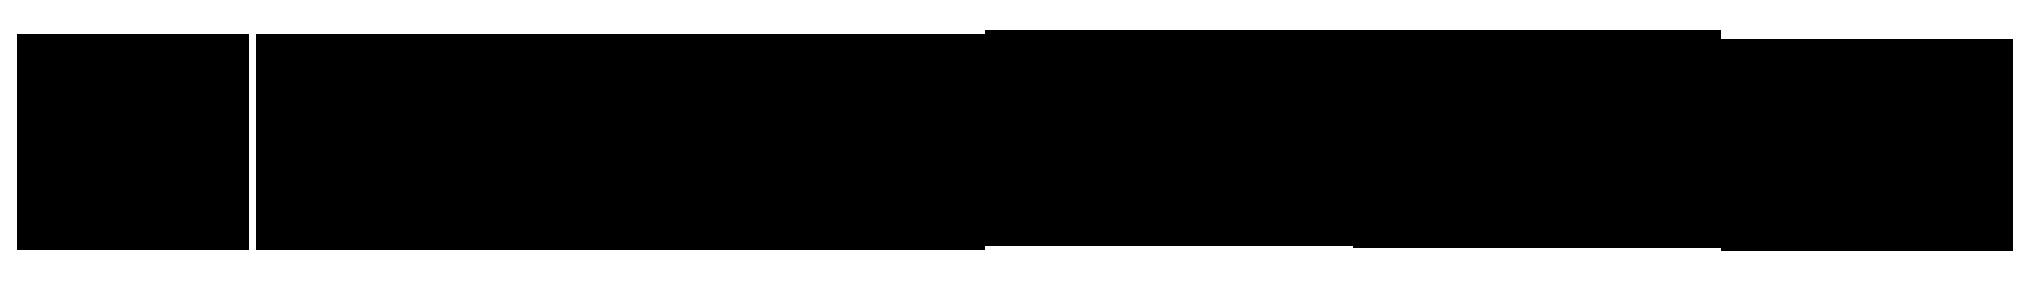 Giorgio-Armani-logo-wordmark